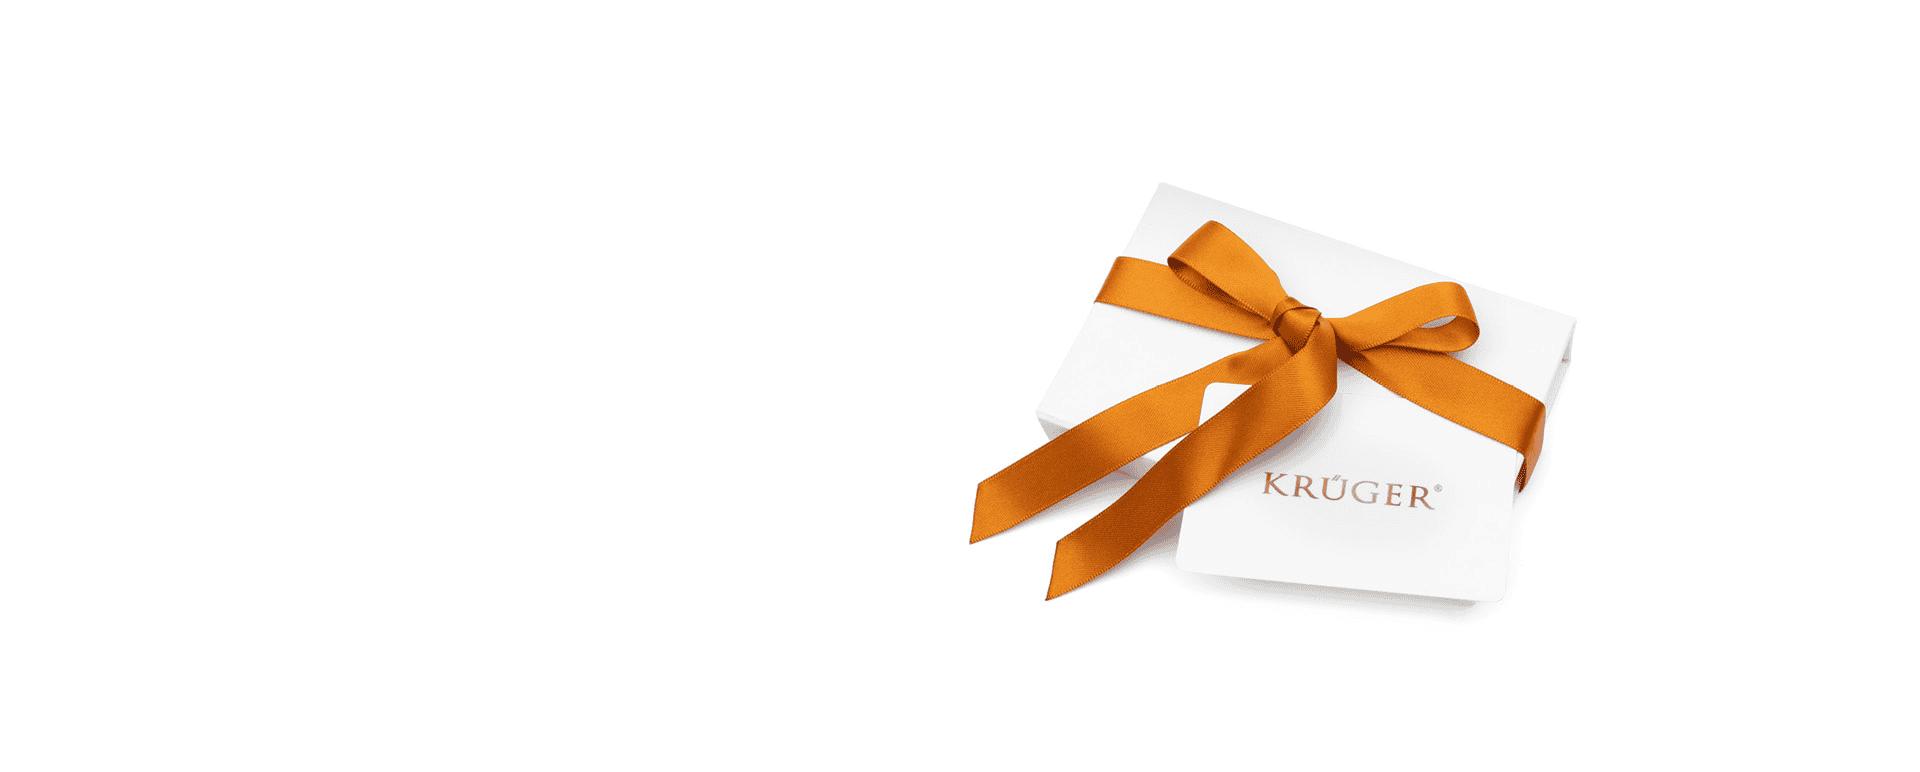 Krüger Geschenkkarte